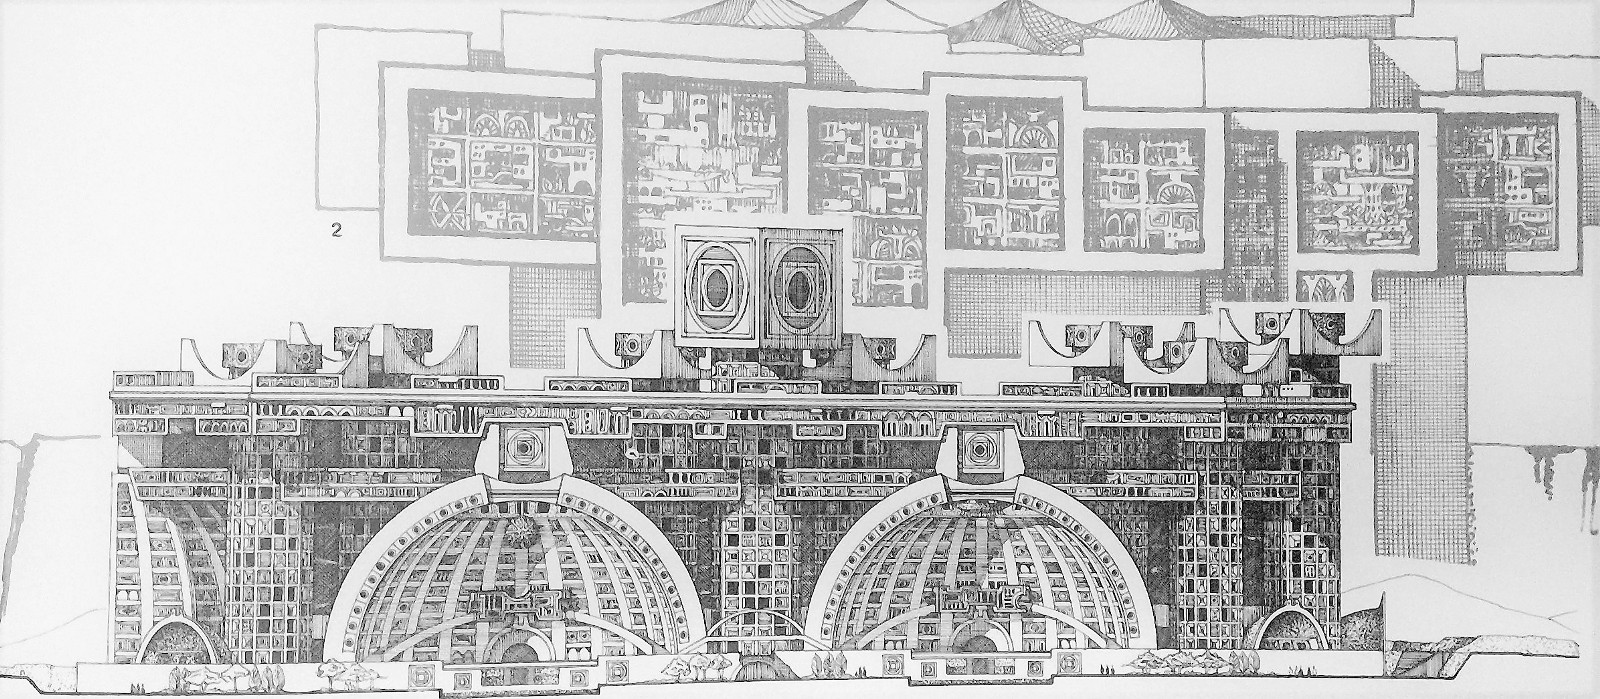 archaic_AlbertoSinigaglia_Arcosanti17.jpeg